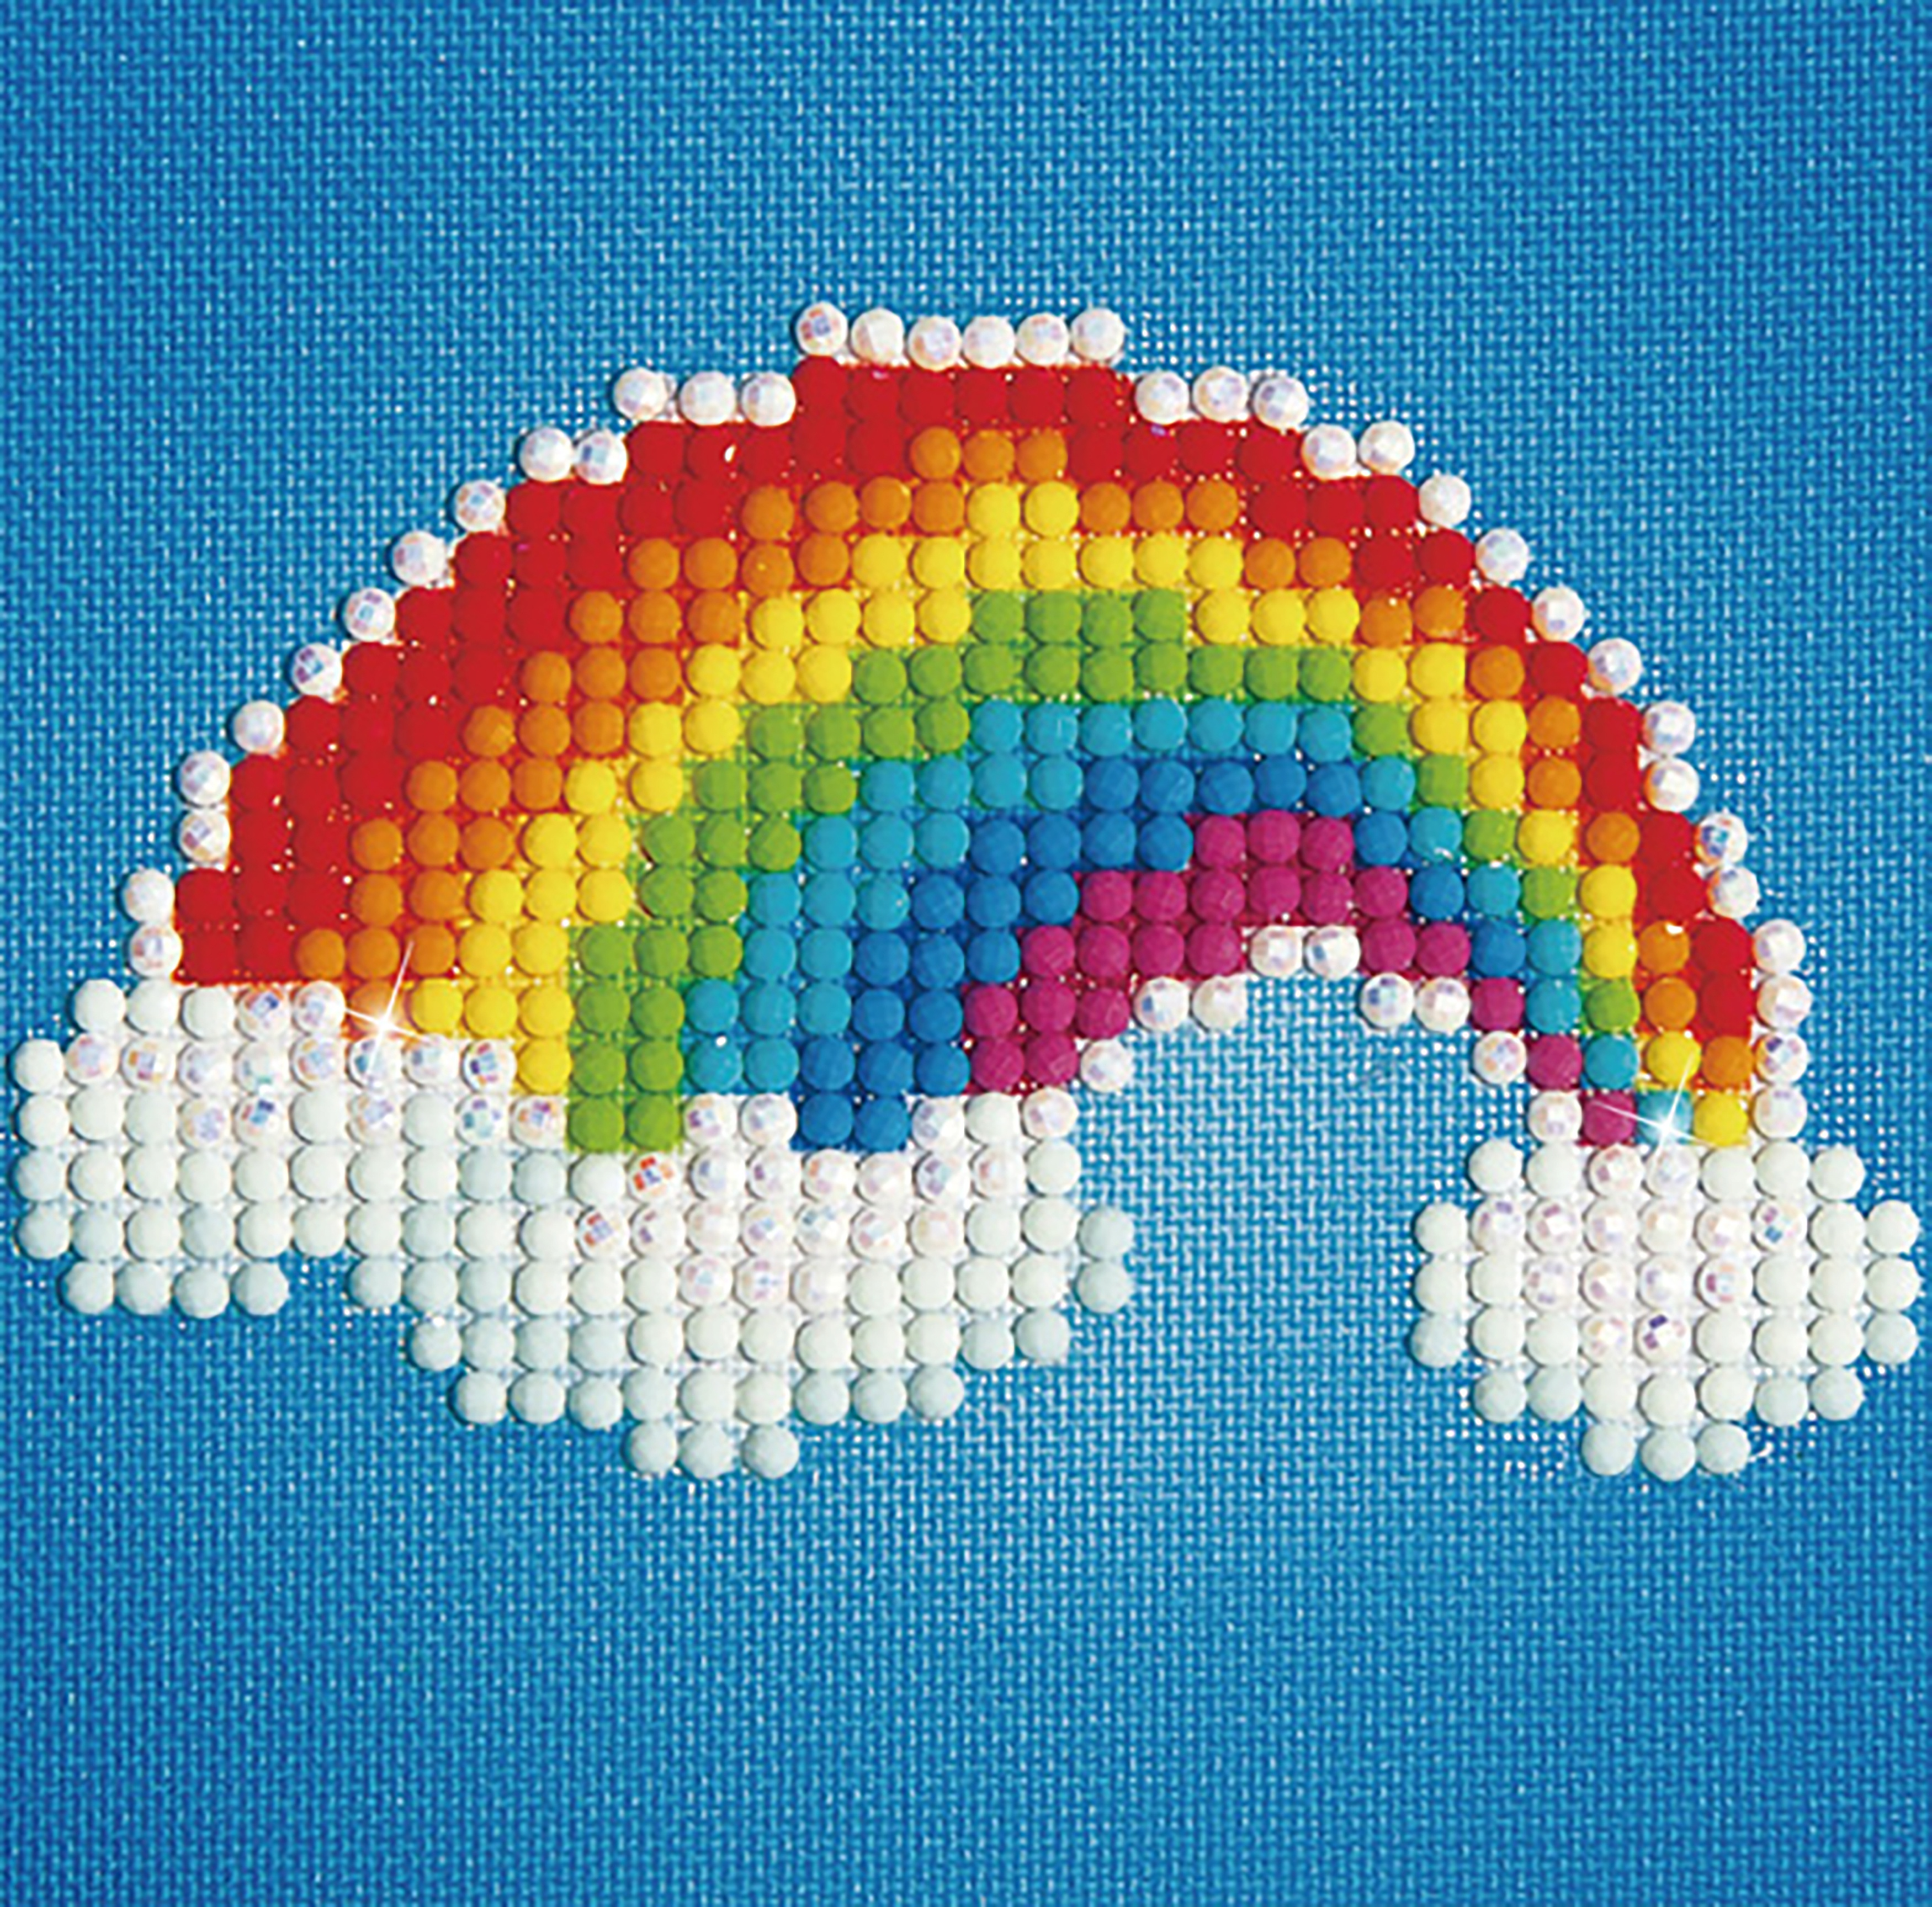 Diamond Dotz Diamond Embroidery Facet Art Kit W/ Frame-Ever Living Rainbow W/ White Frame